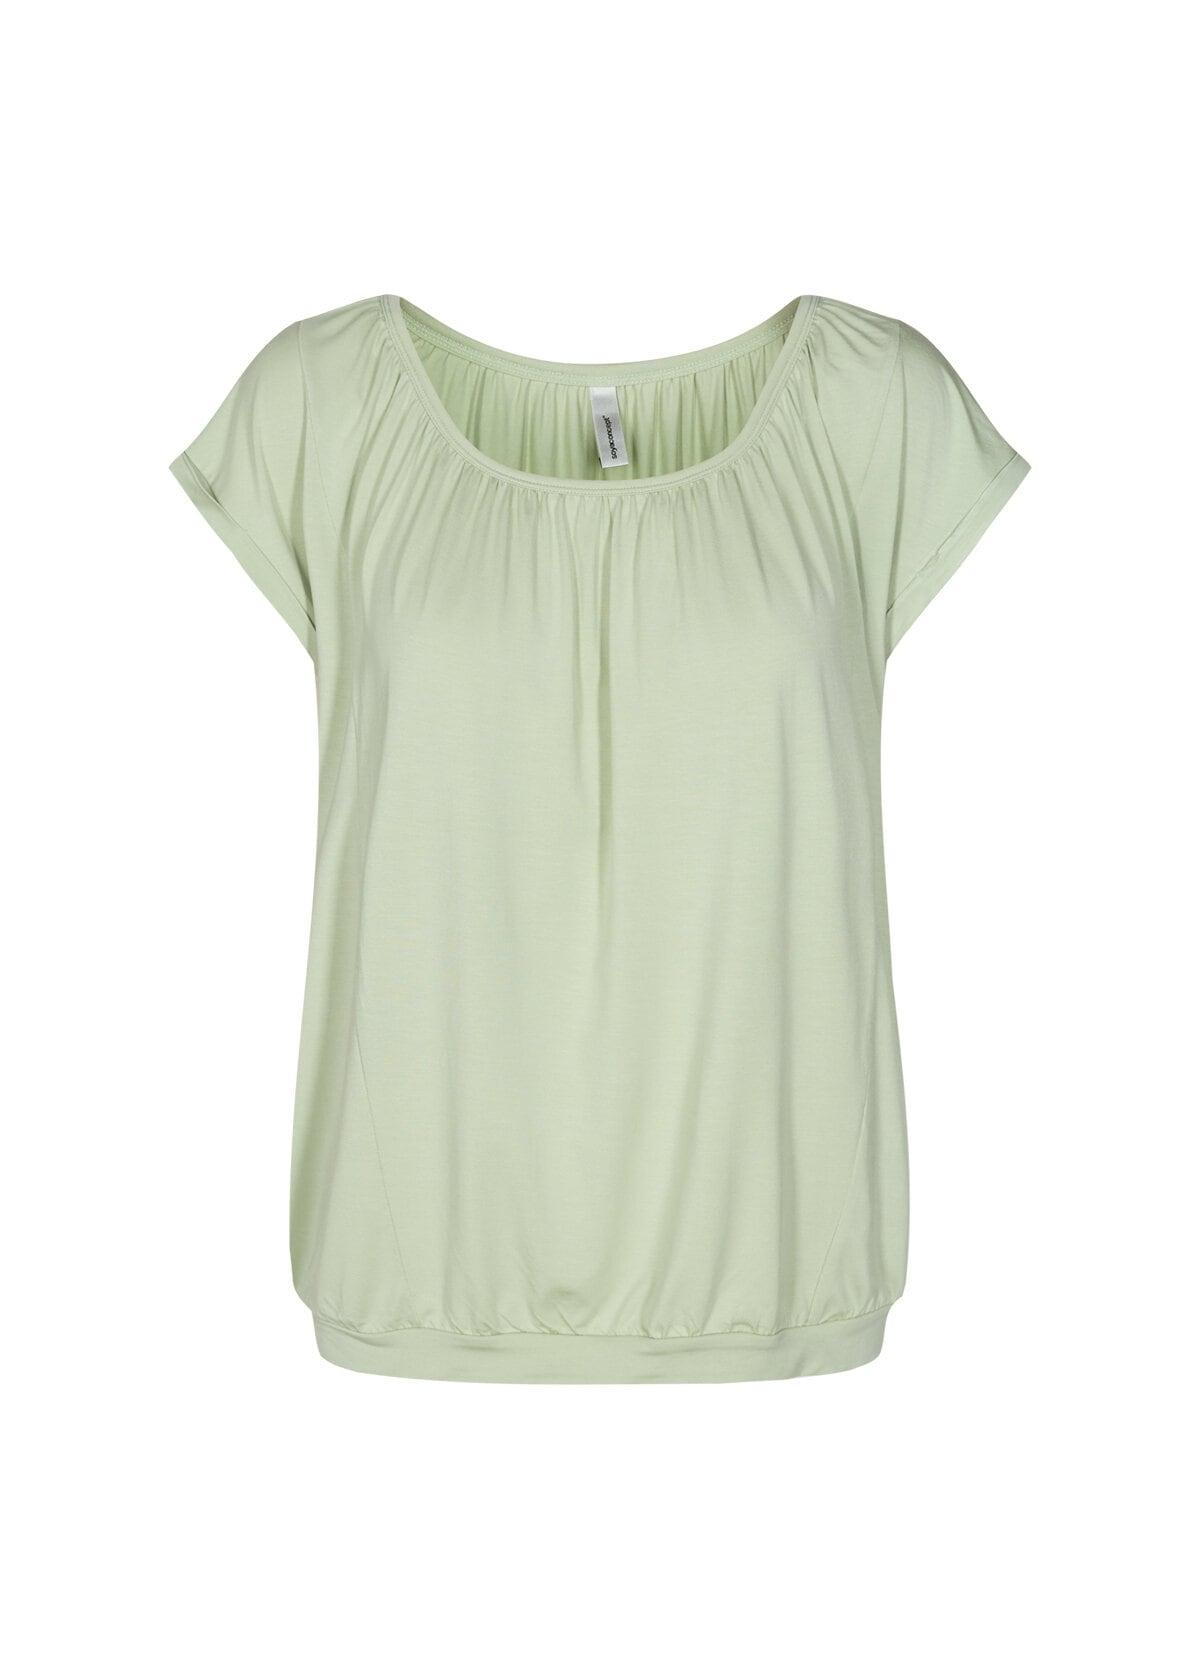 Marica Topp - Light Green